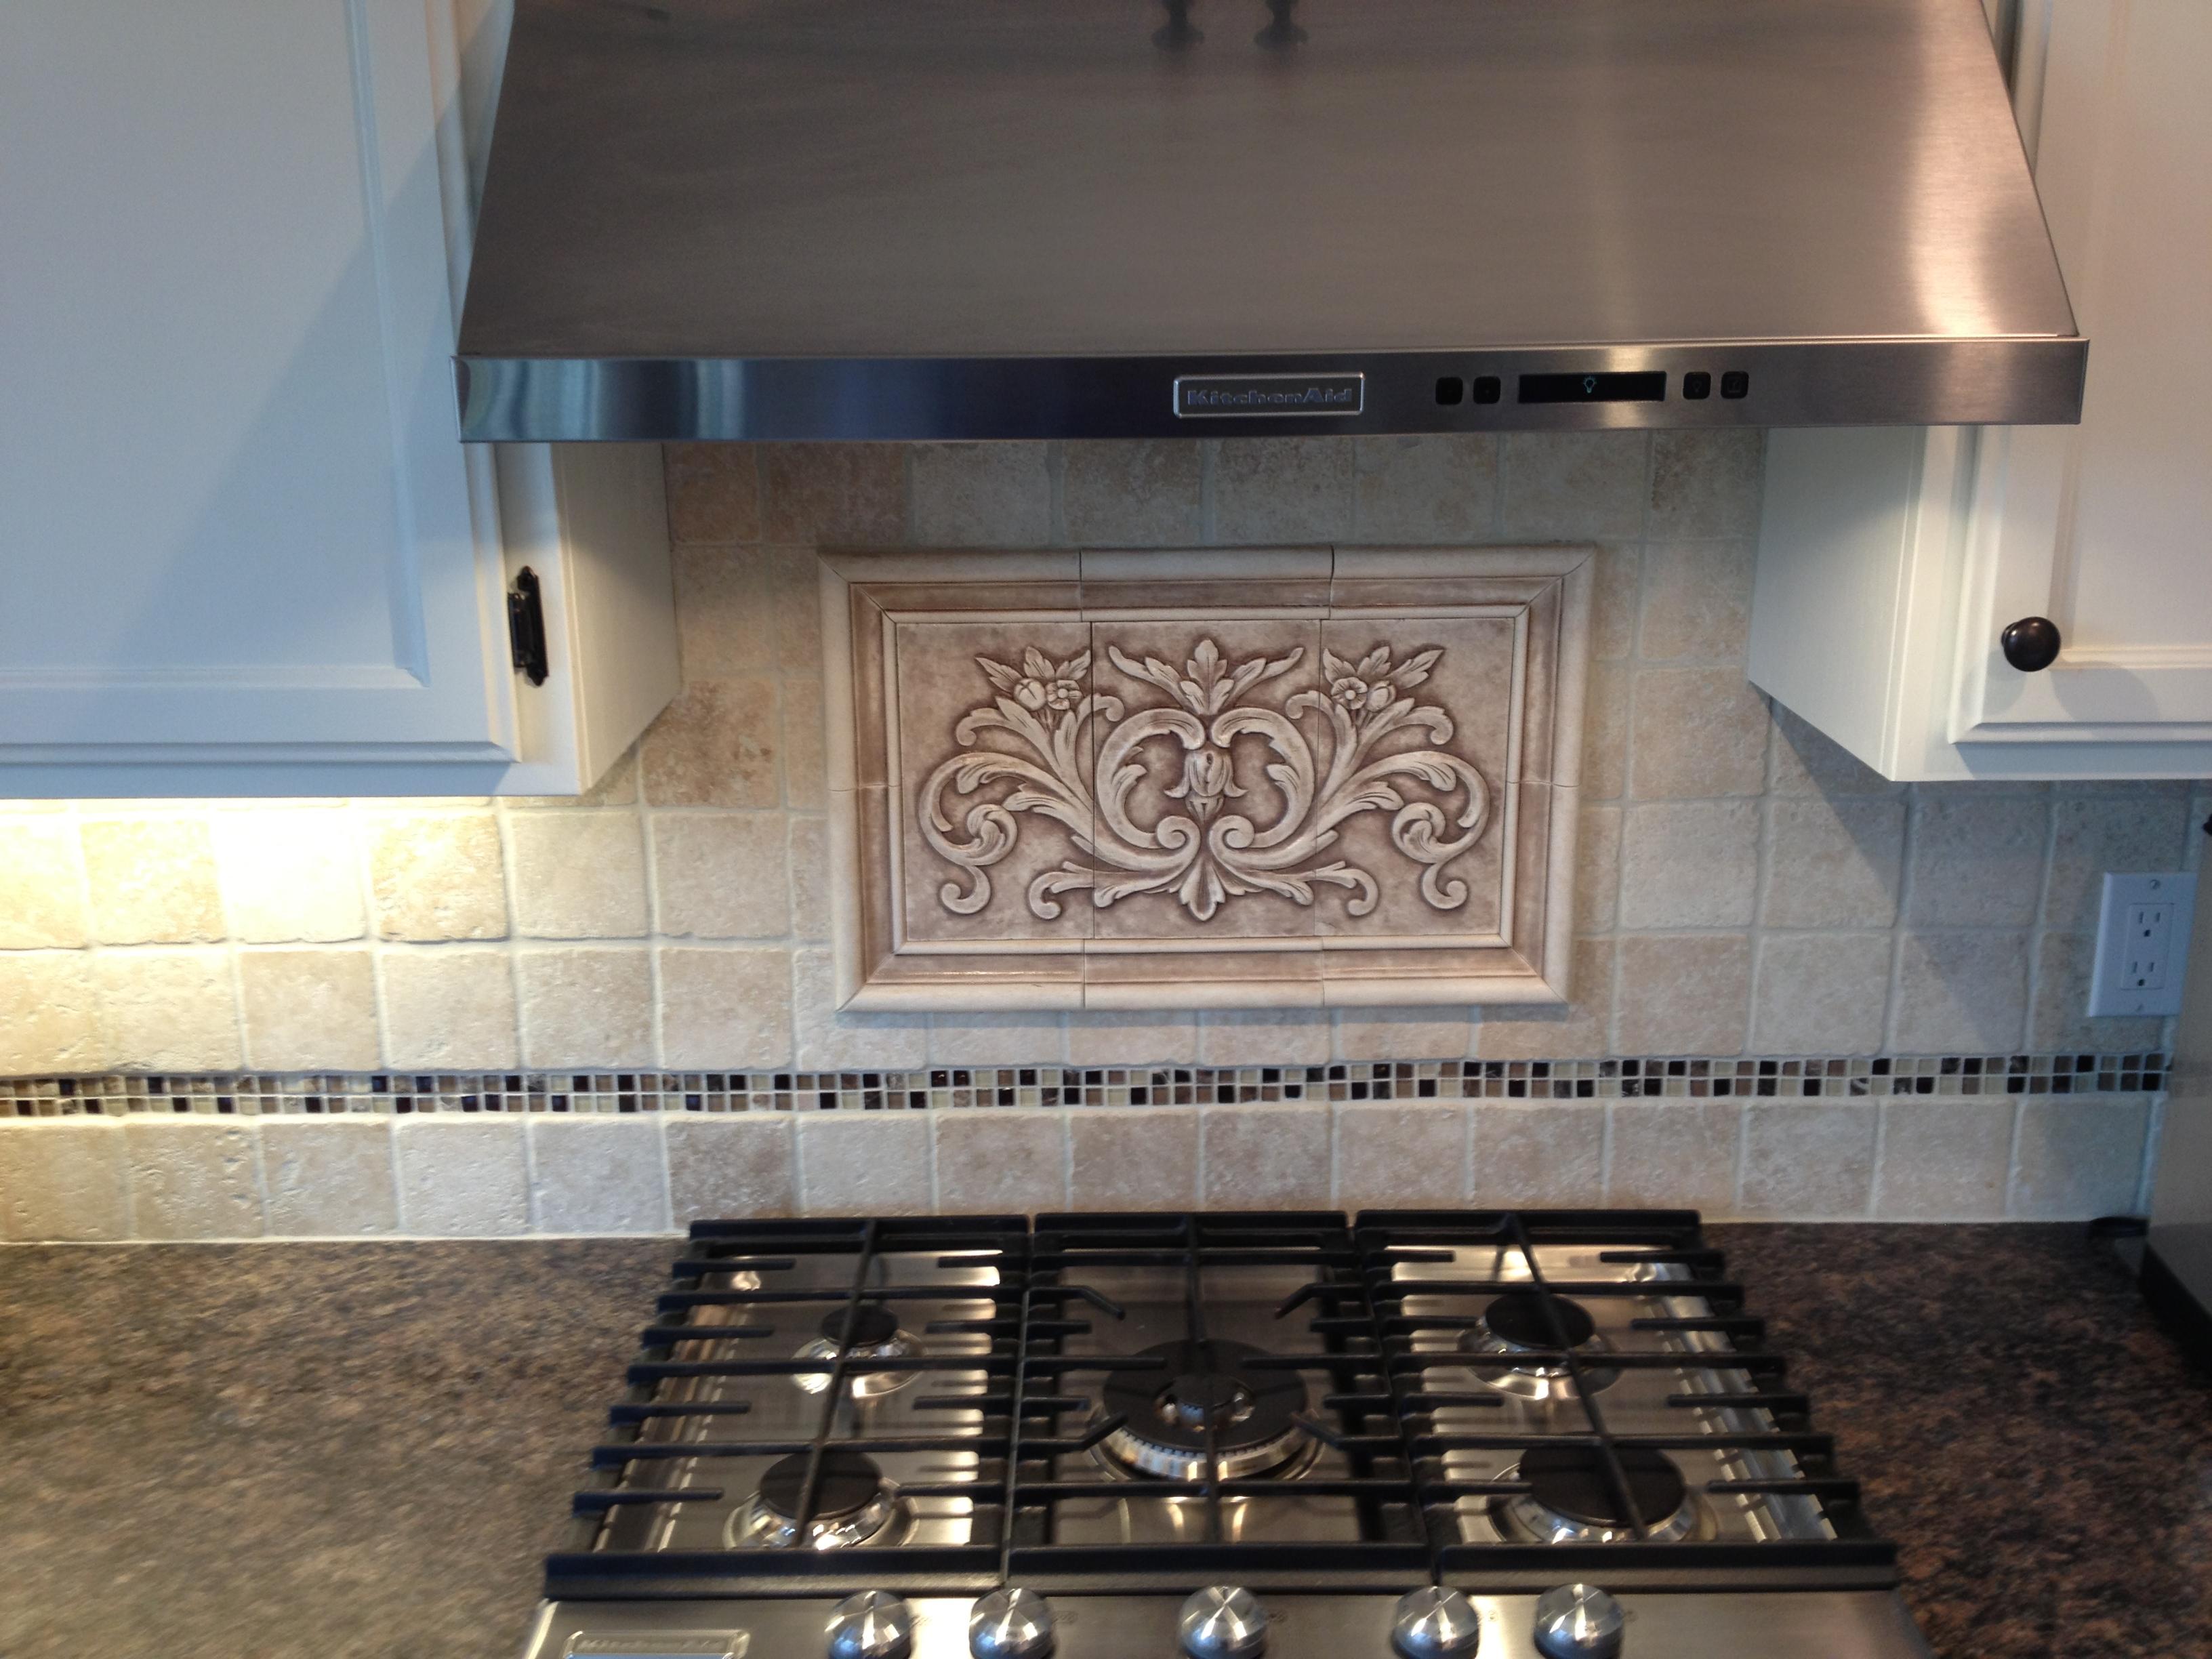 hand pressed floral tiles installed in kitchen backsplash f pf photo